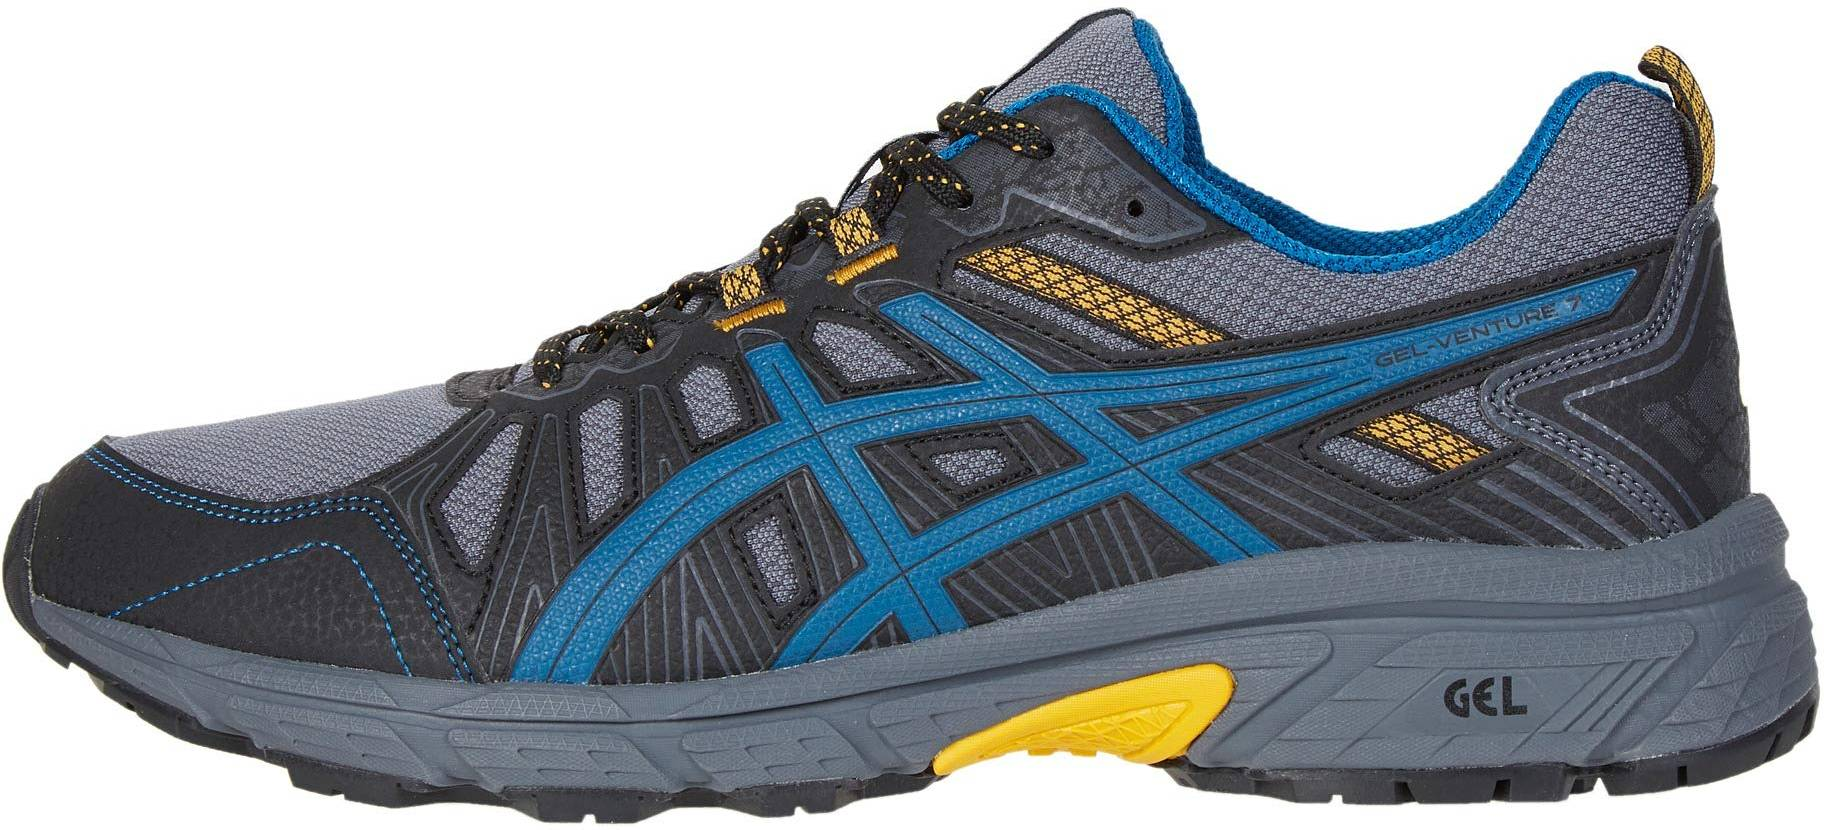 40 Asics trail running shoes - Save 33% | RunRepeat